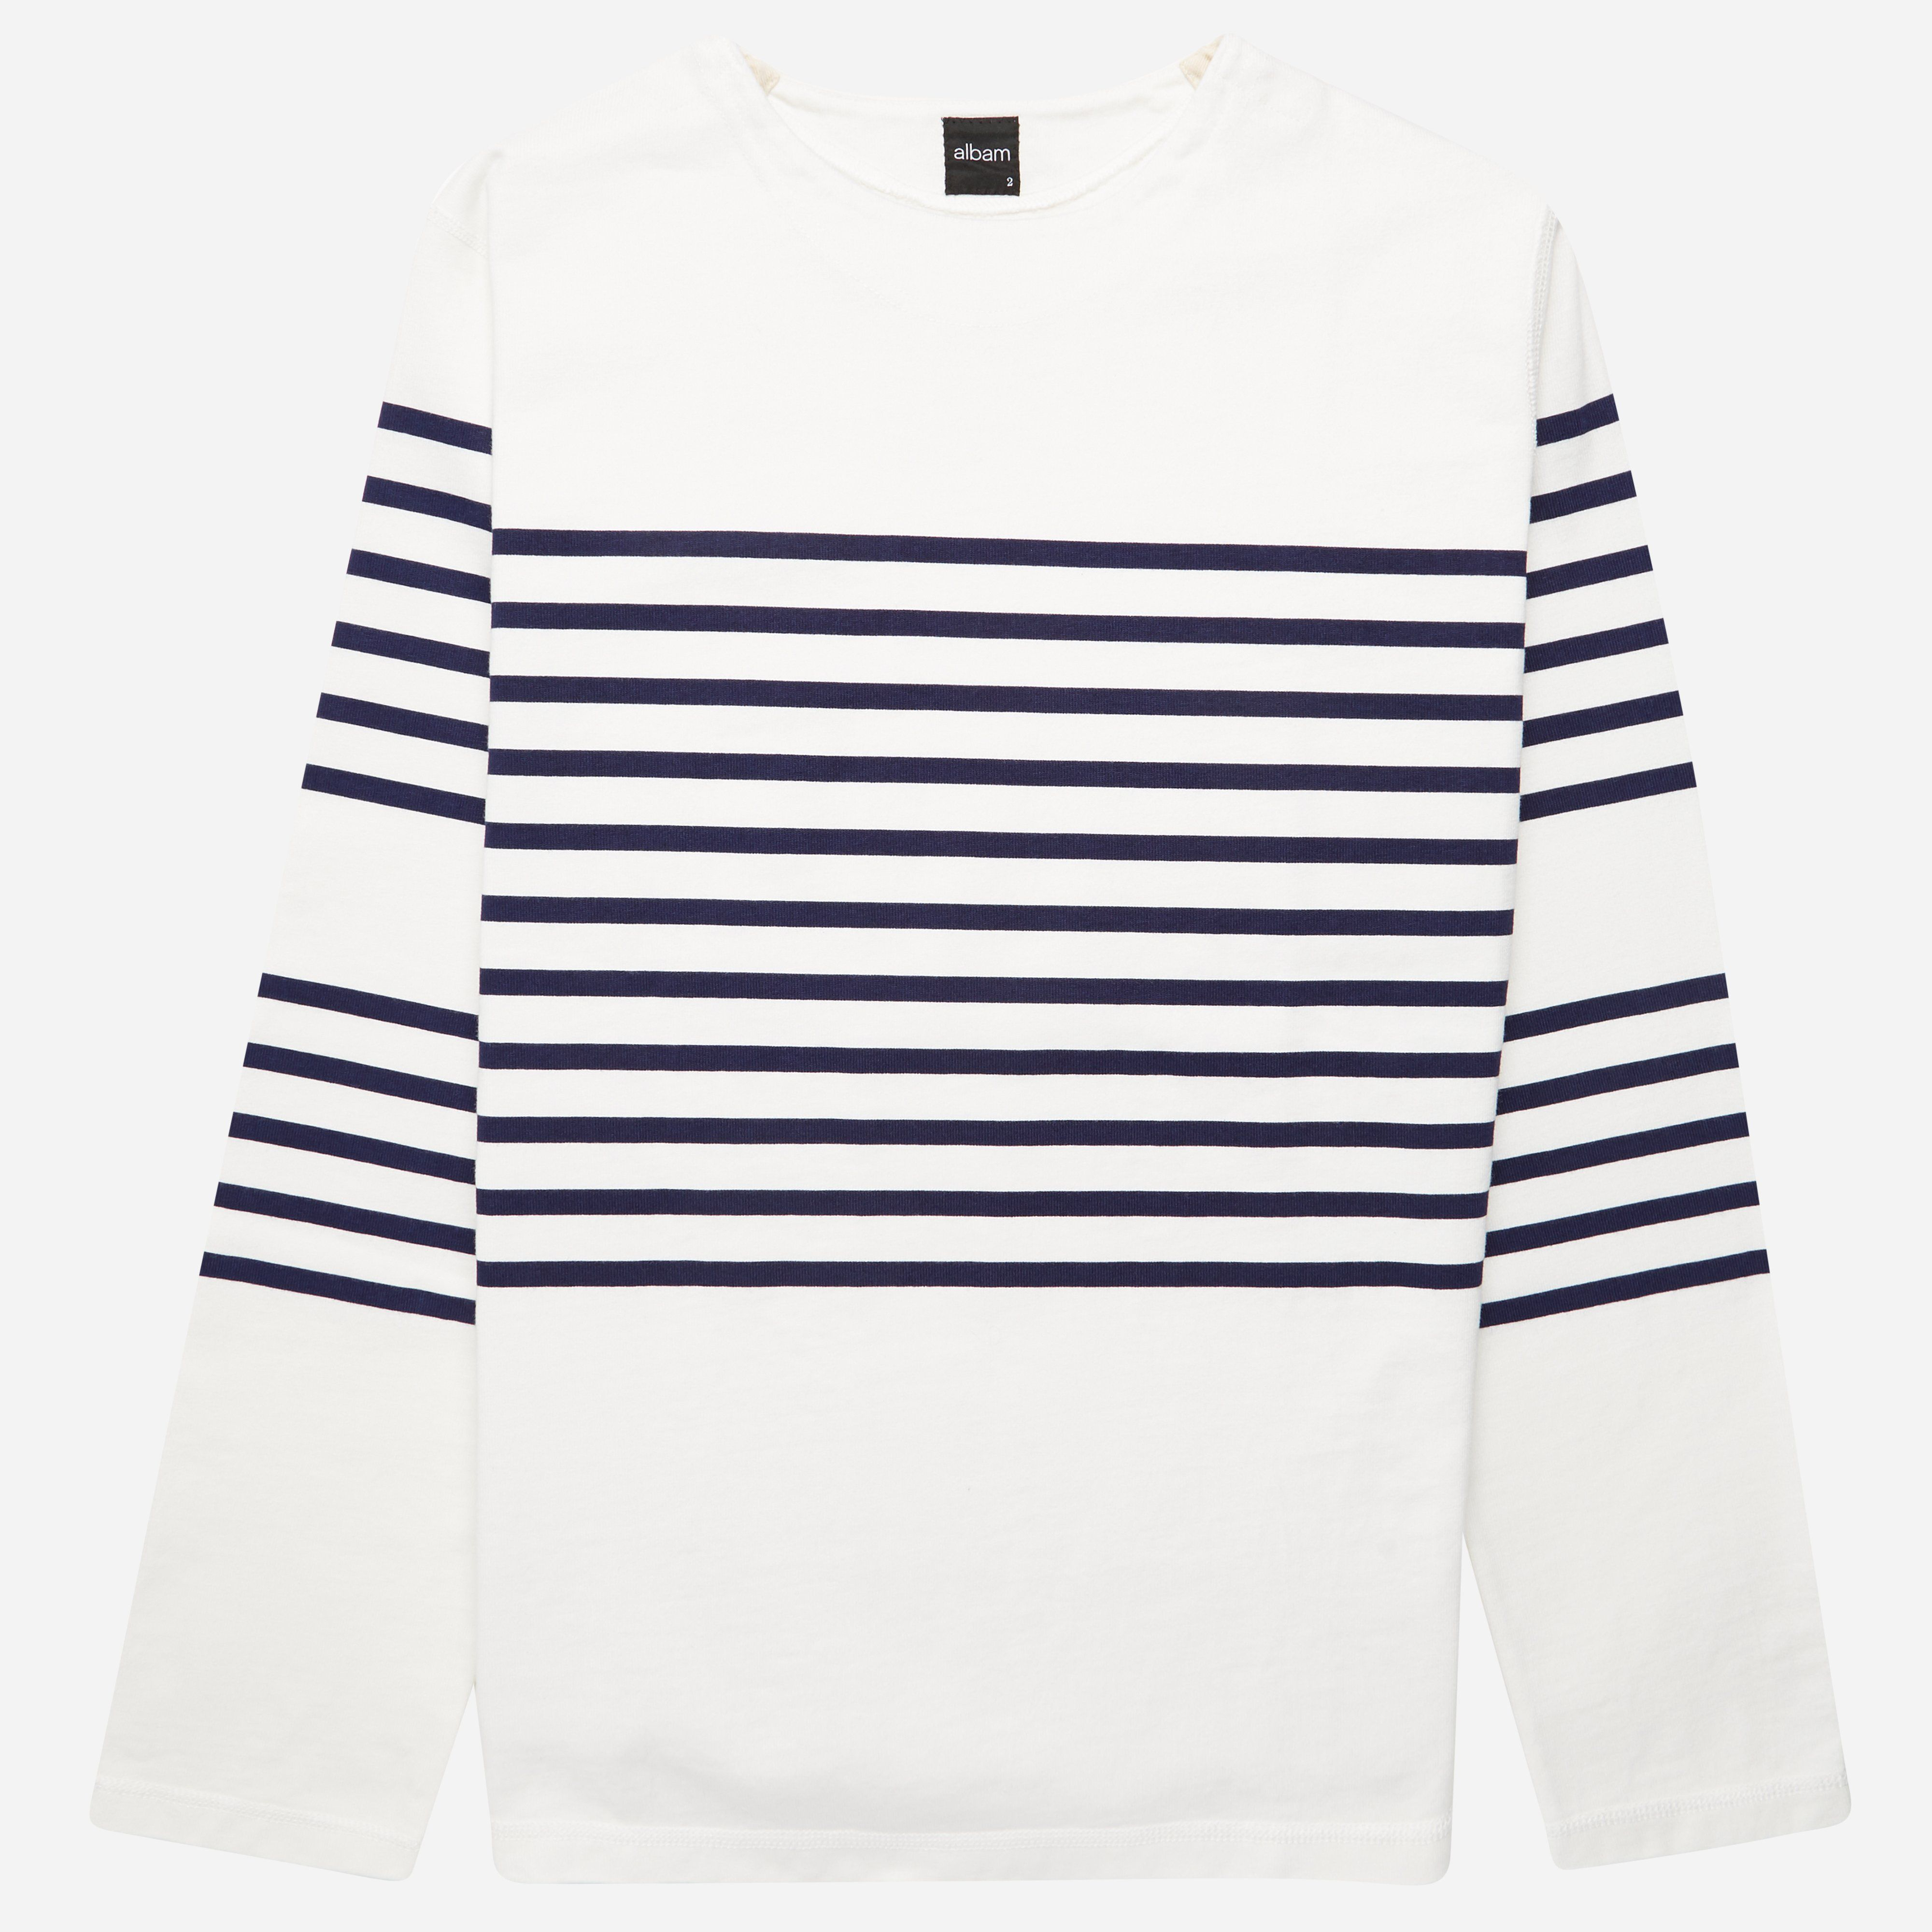 Albam Stripe Breton T-shirt